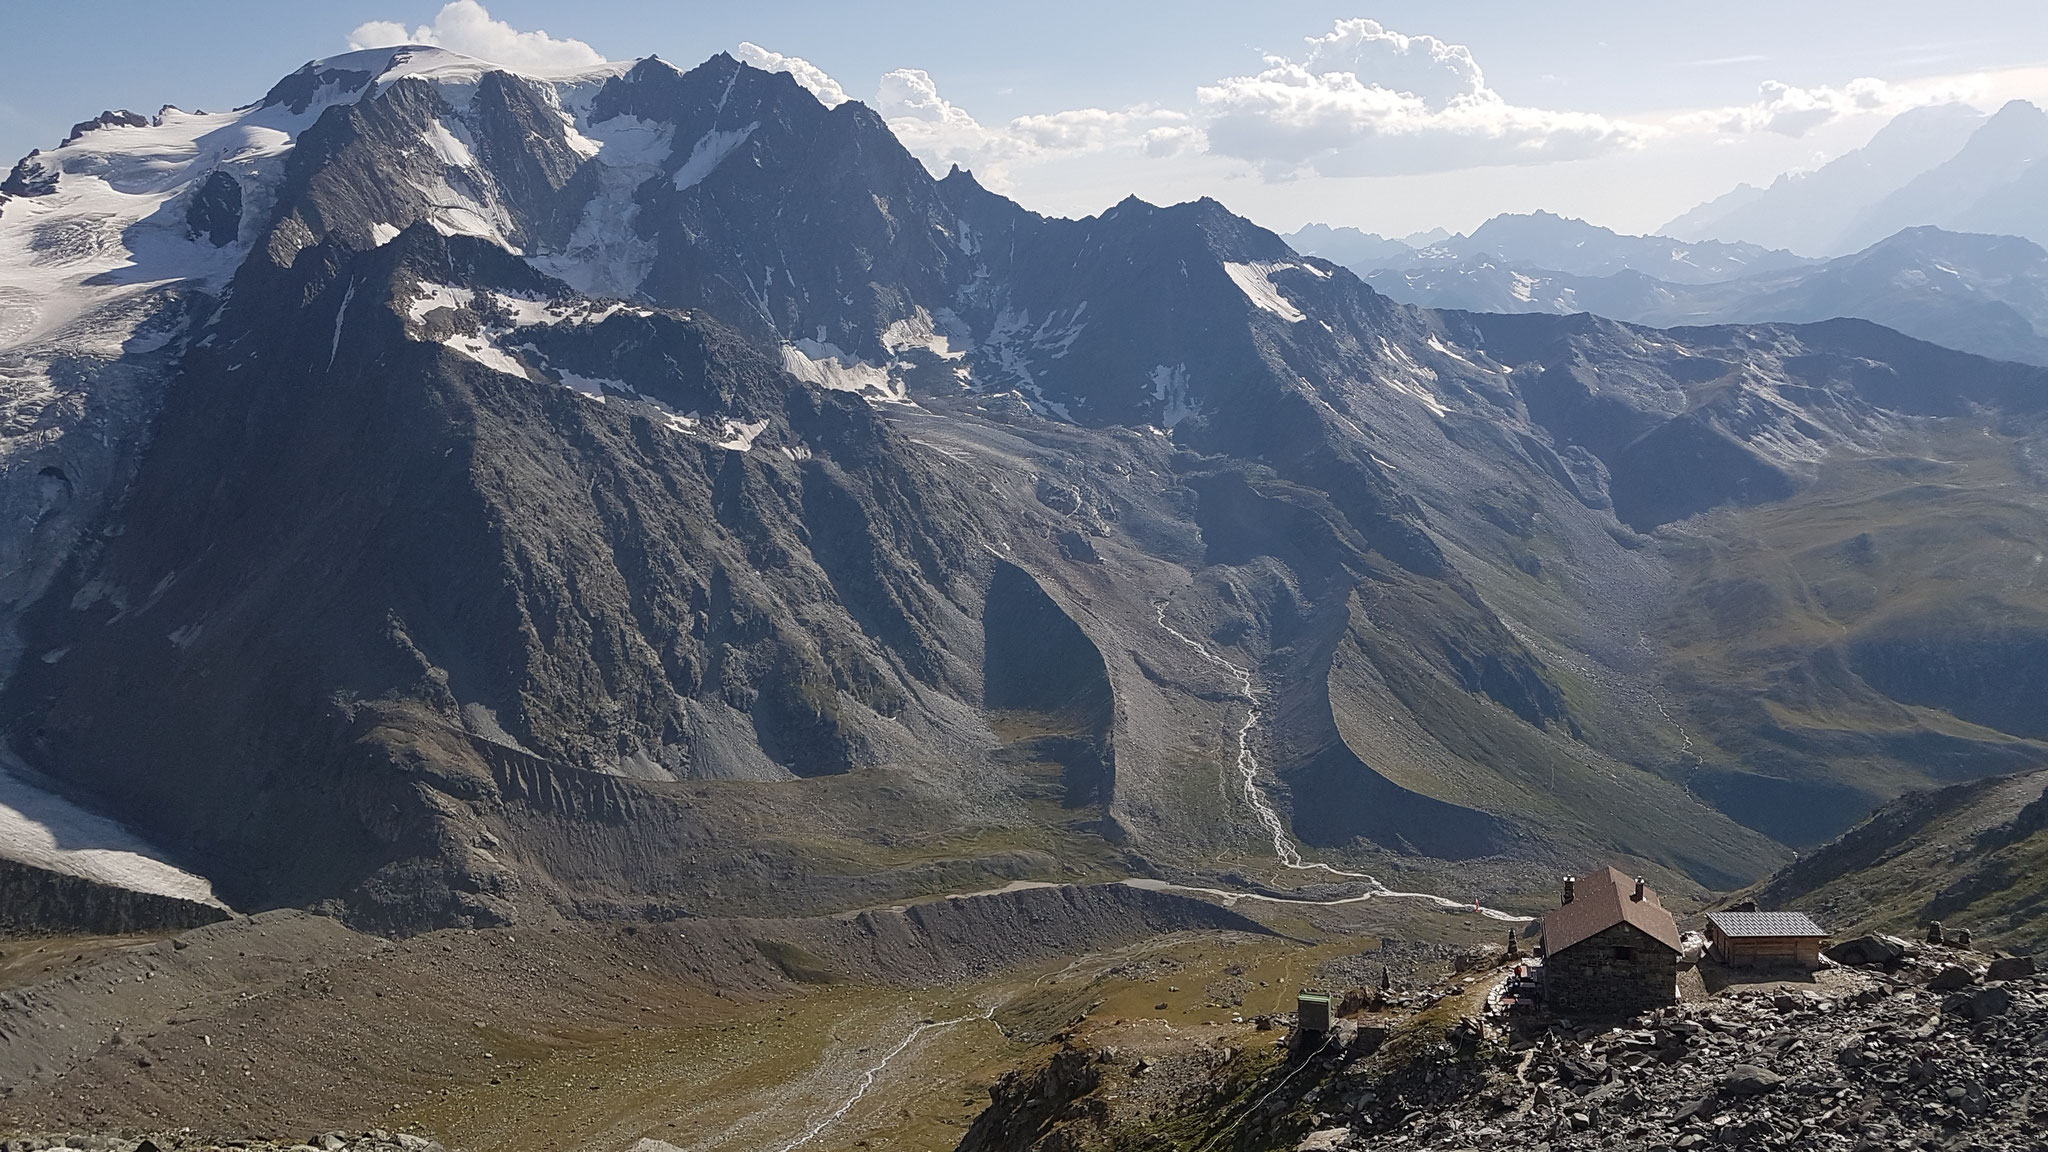 Cabane de Valsorey / Valsorey-Hütte, 3037 m vor dem Mont Velan